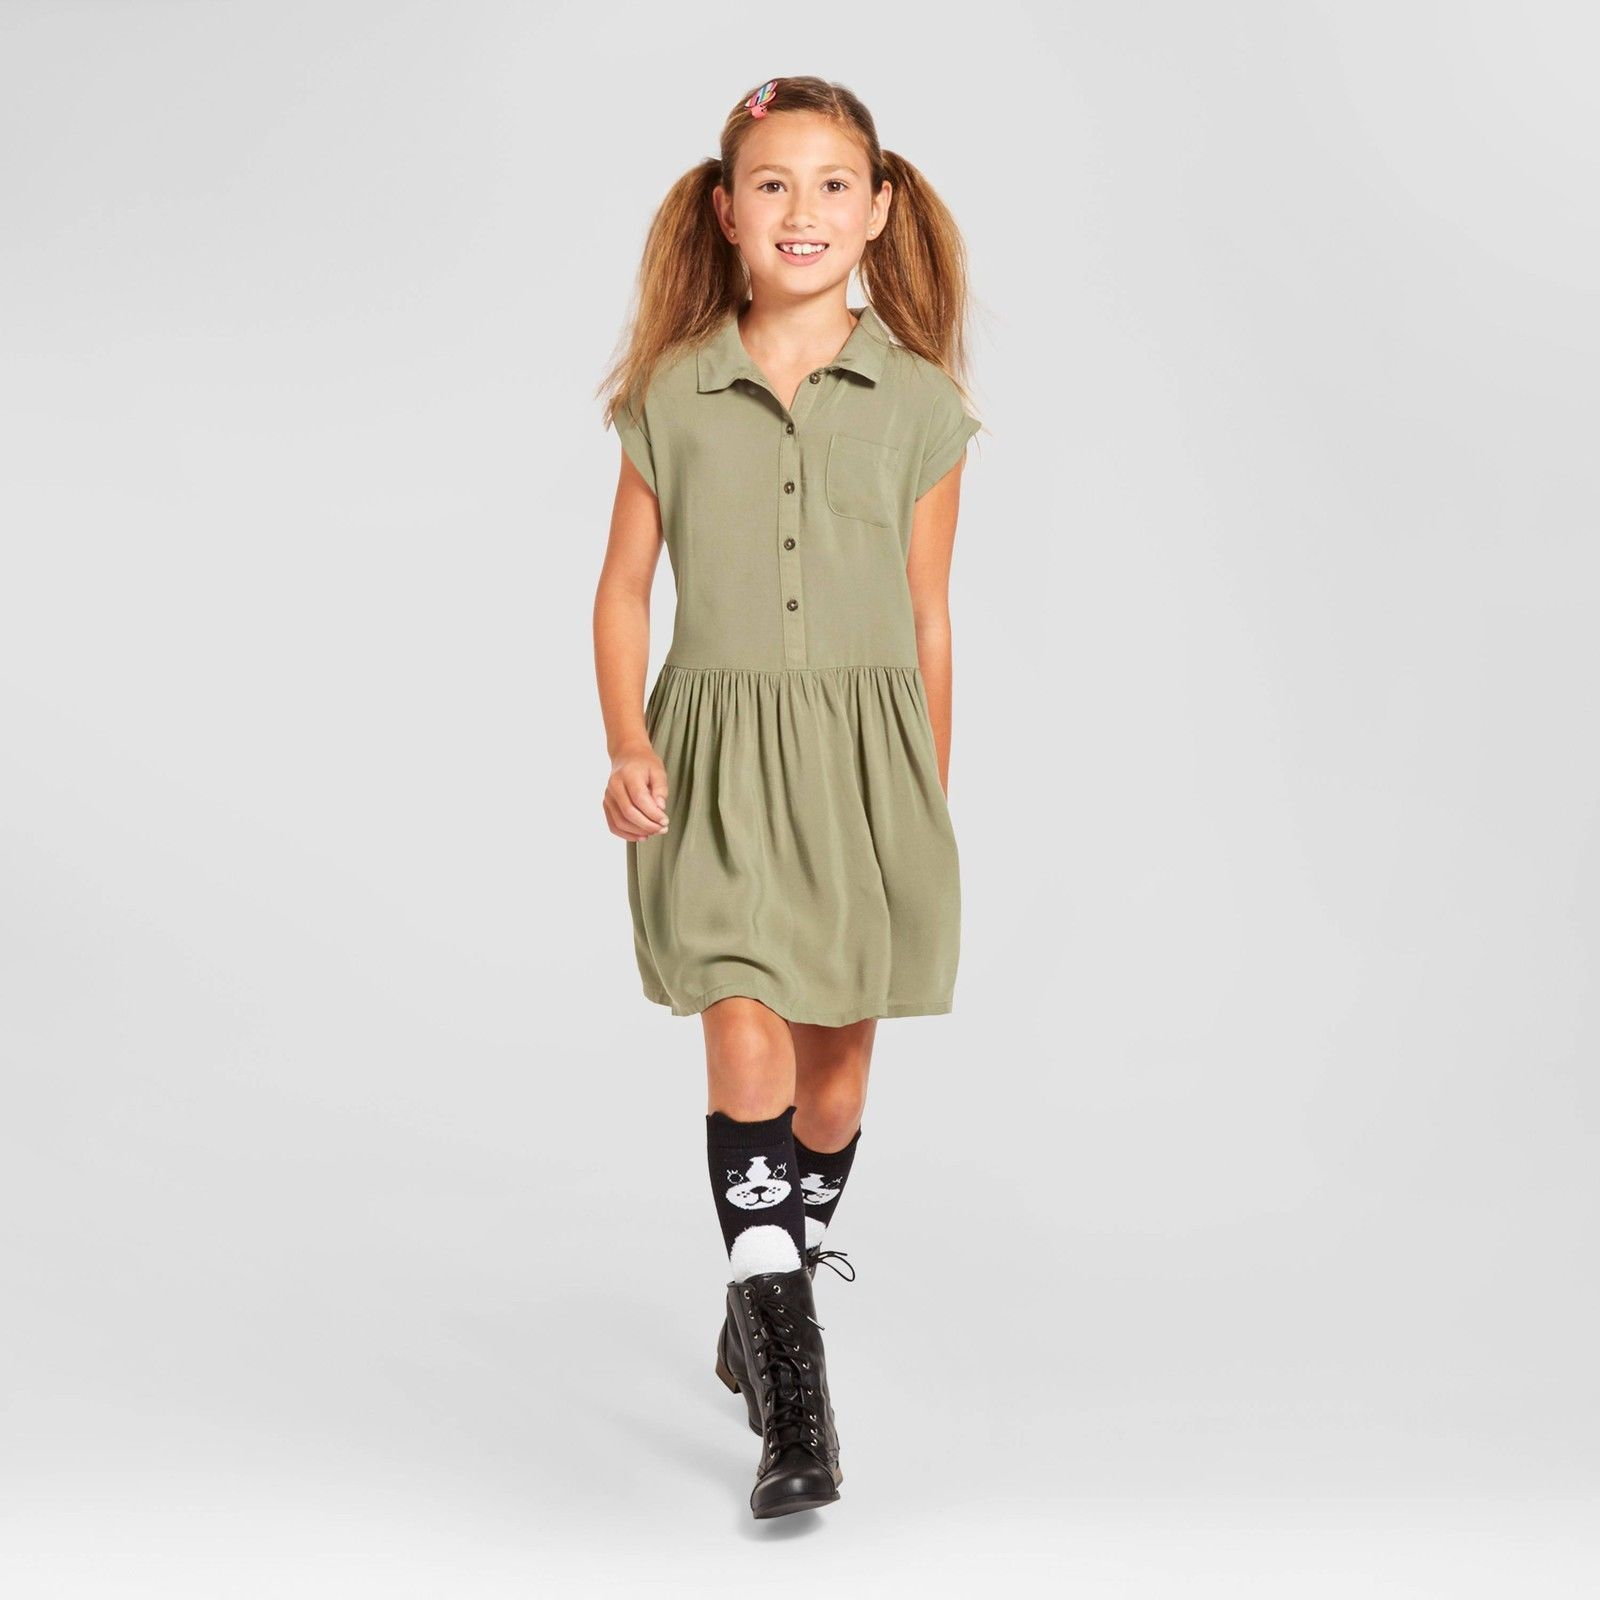 NWT Cat & Jack Girls' Sage A-Line Dress - Sizes XS 4/5 or XL 14/16